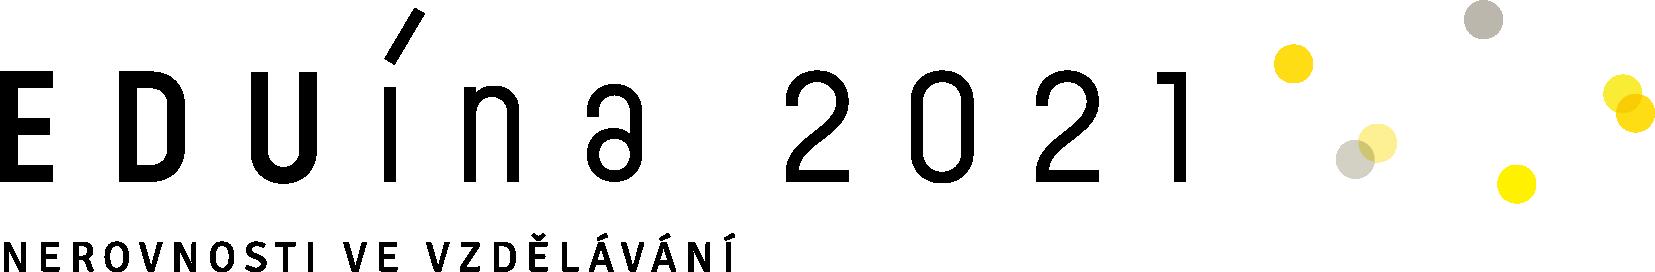 EDUINA_2021_sirka_text_RGB_screen-1